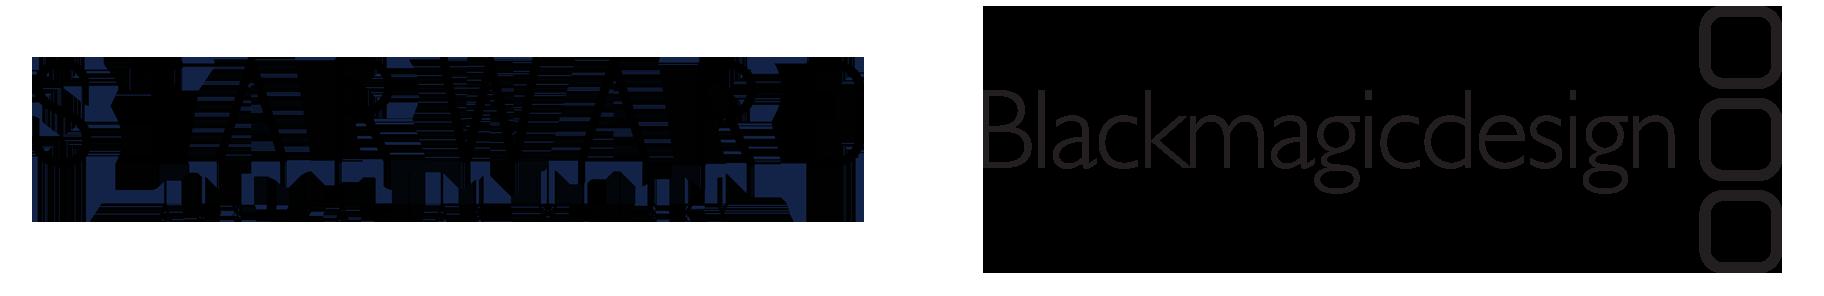 Logos: Starward and Black Magic